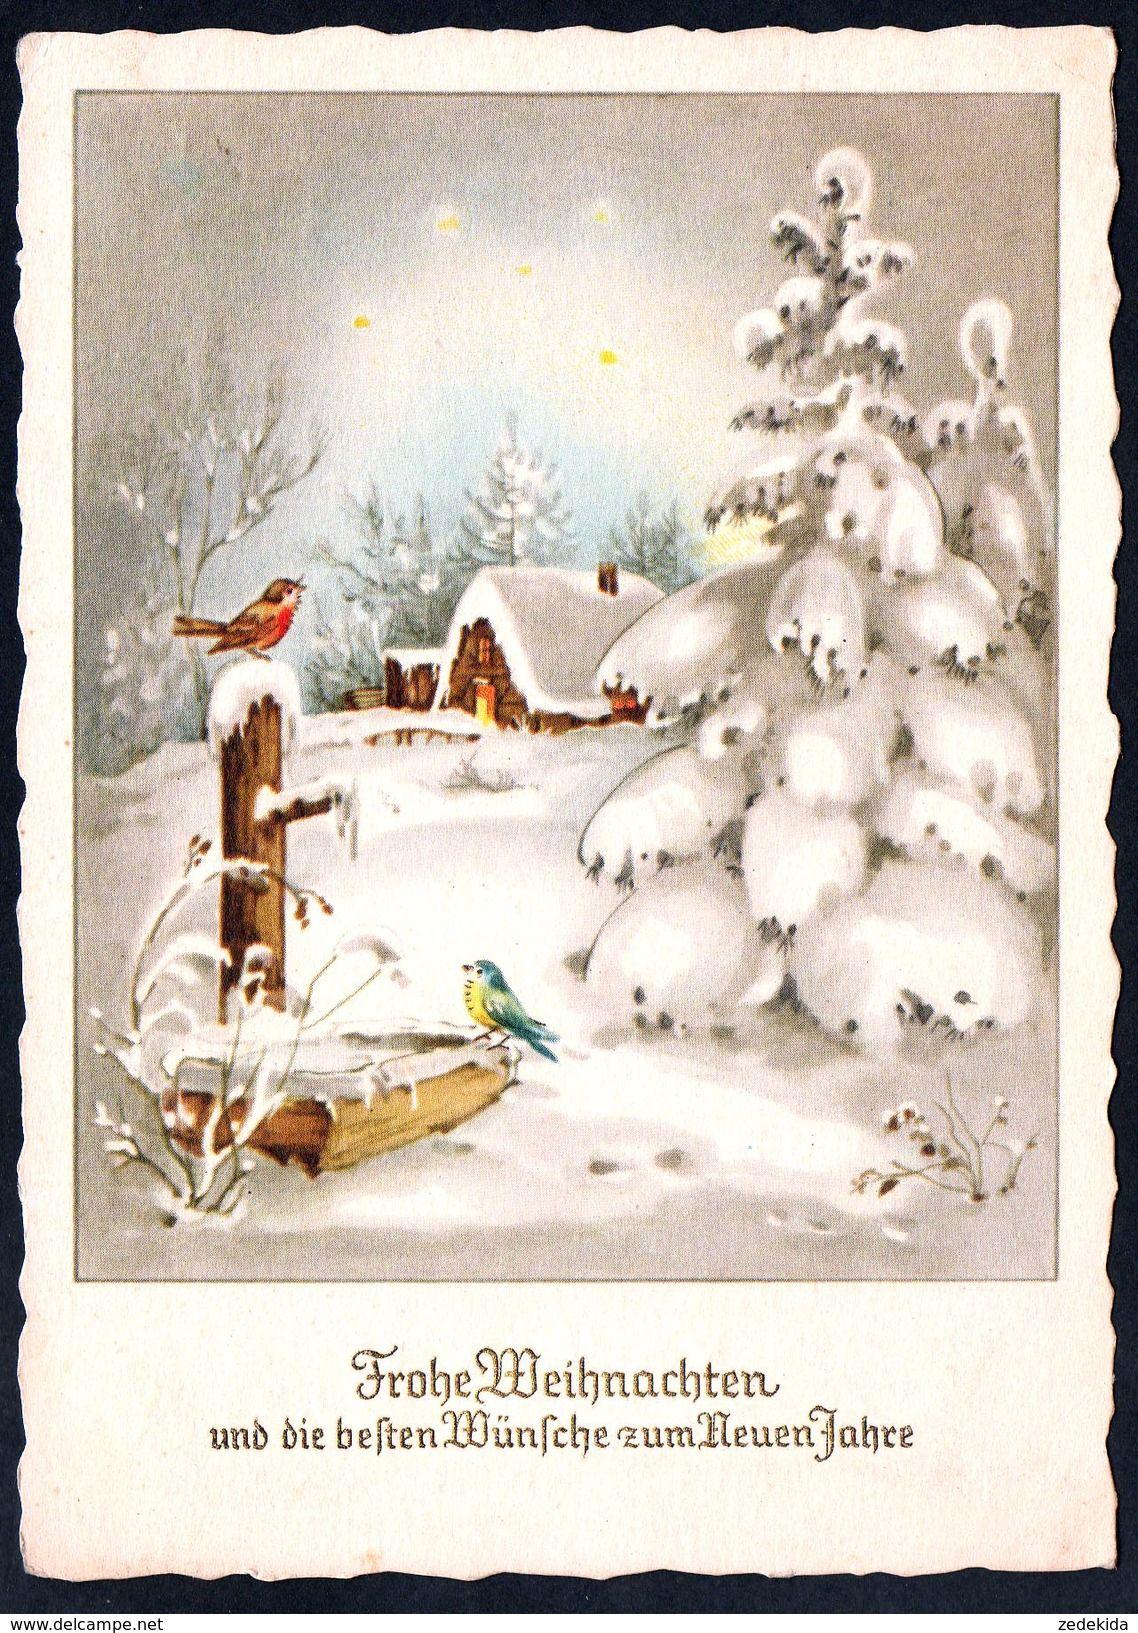 https://images-03.delcampe-static.net/img_large/auction/000/417/475/278_001_7825-alte-kuenstlerkarte-weihnachten-winterlandschaft-horn.jpg?v=0